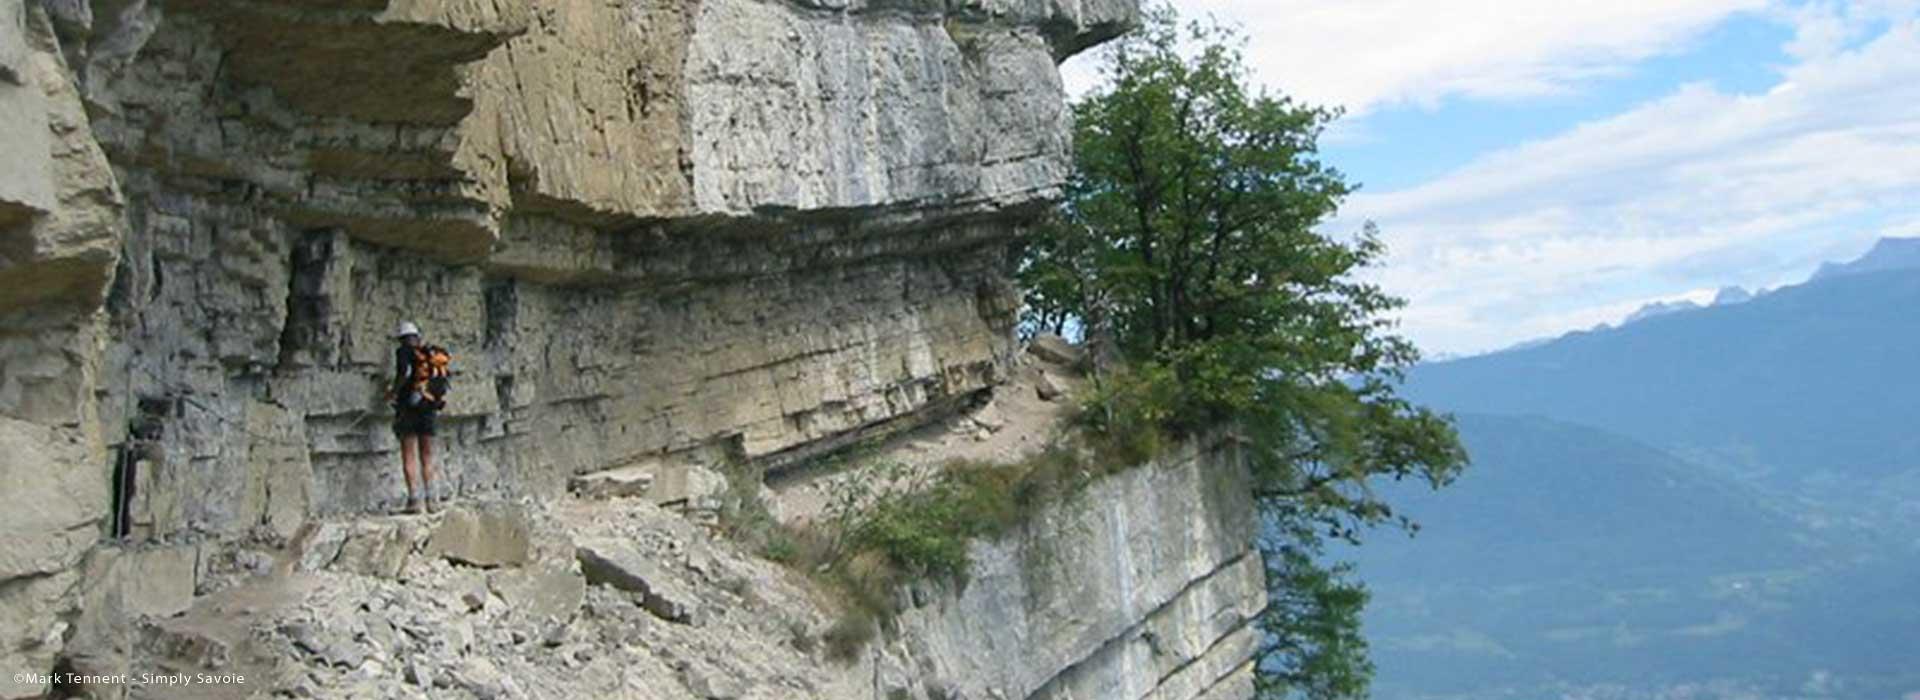 Via ferrata with views below, French Alps